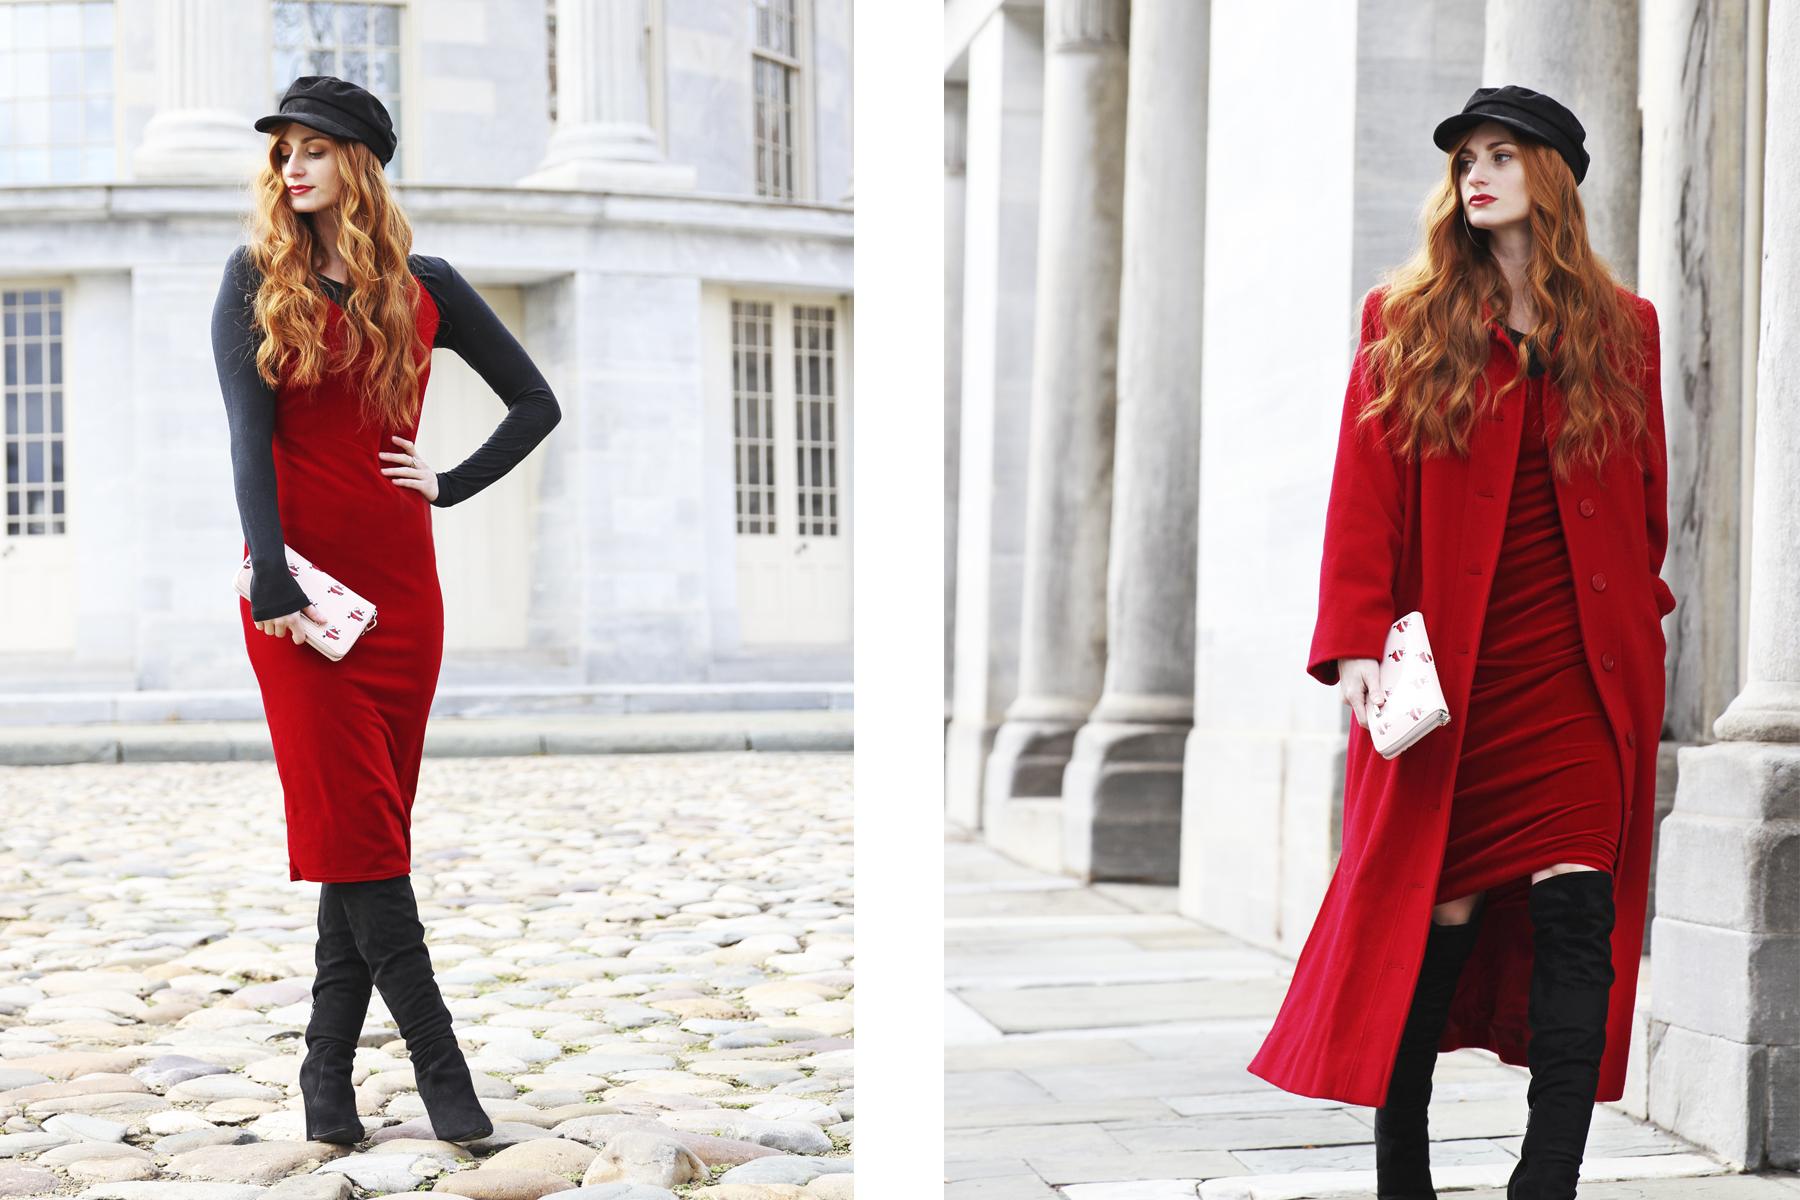 Erin Leigh, She's Red Haute wearing red velvet dress with red coat